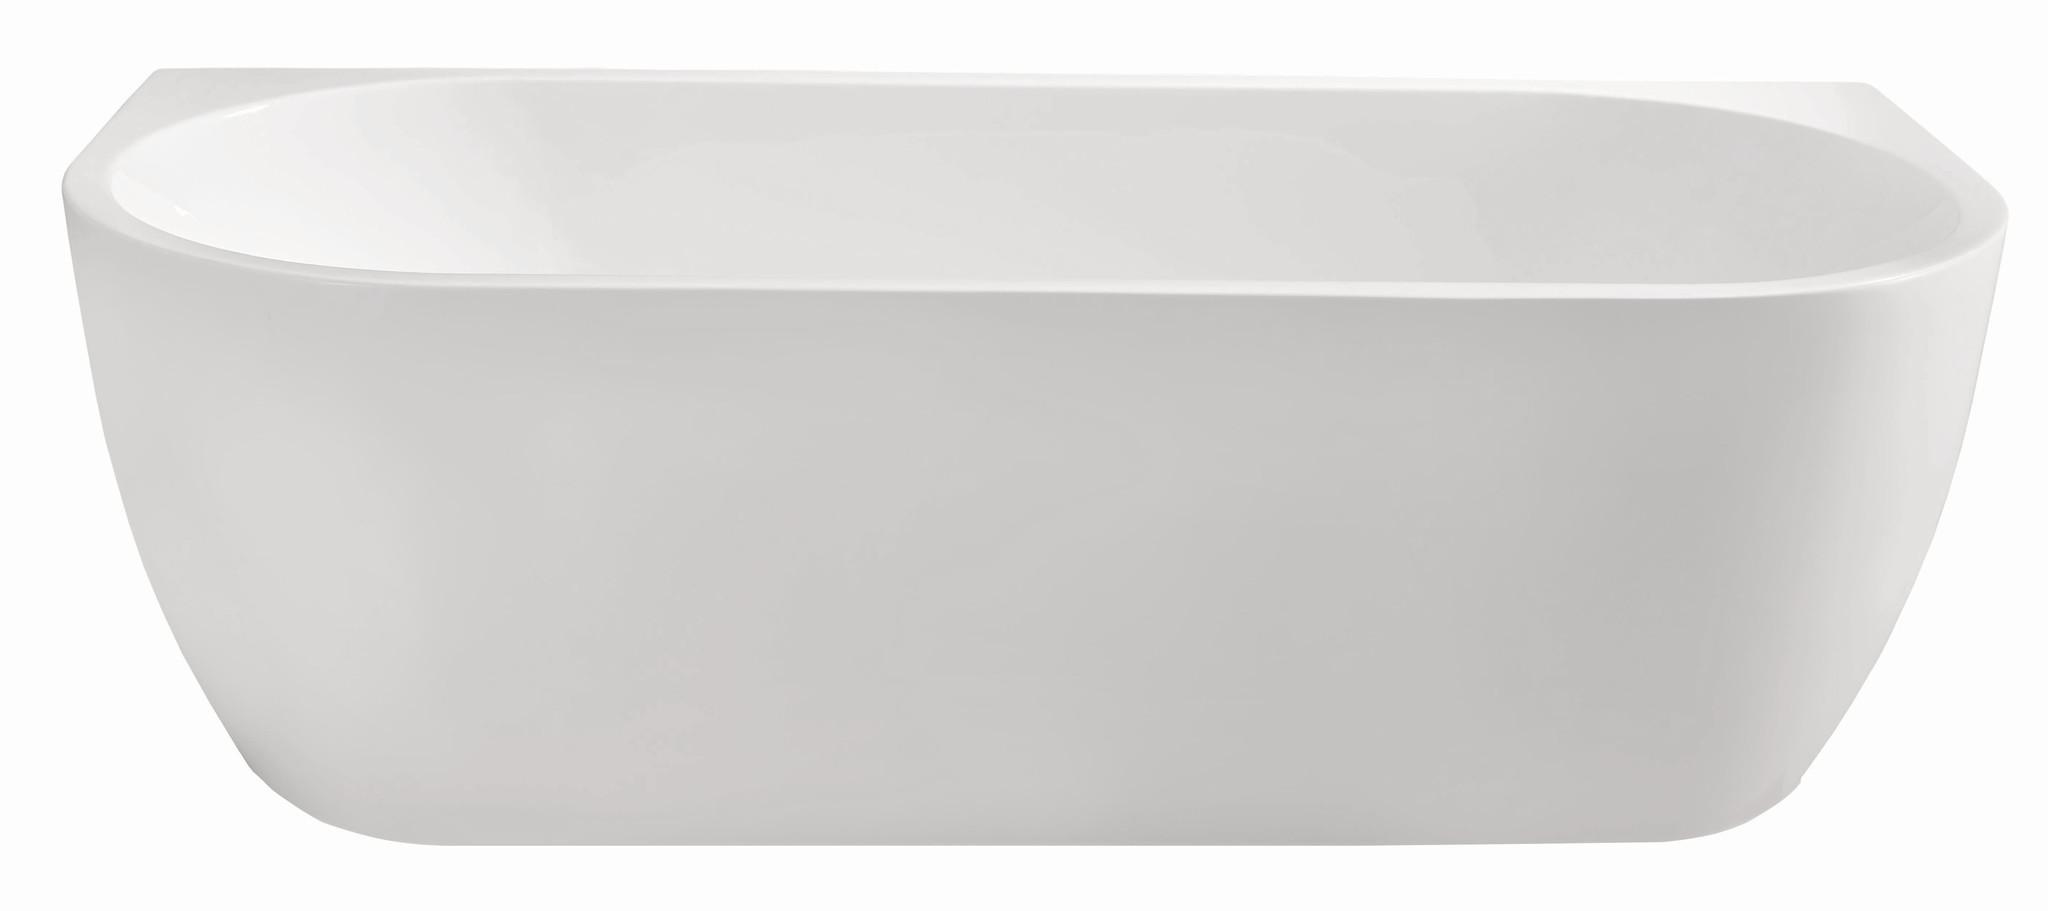 Linea Uno Wall half-vrijstaand acryl ligbad 170x75 wit